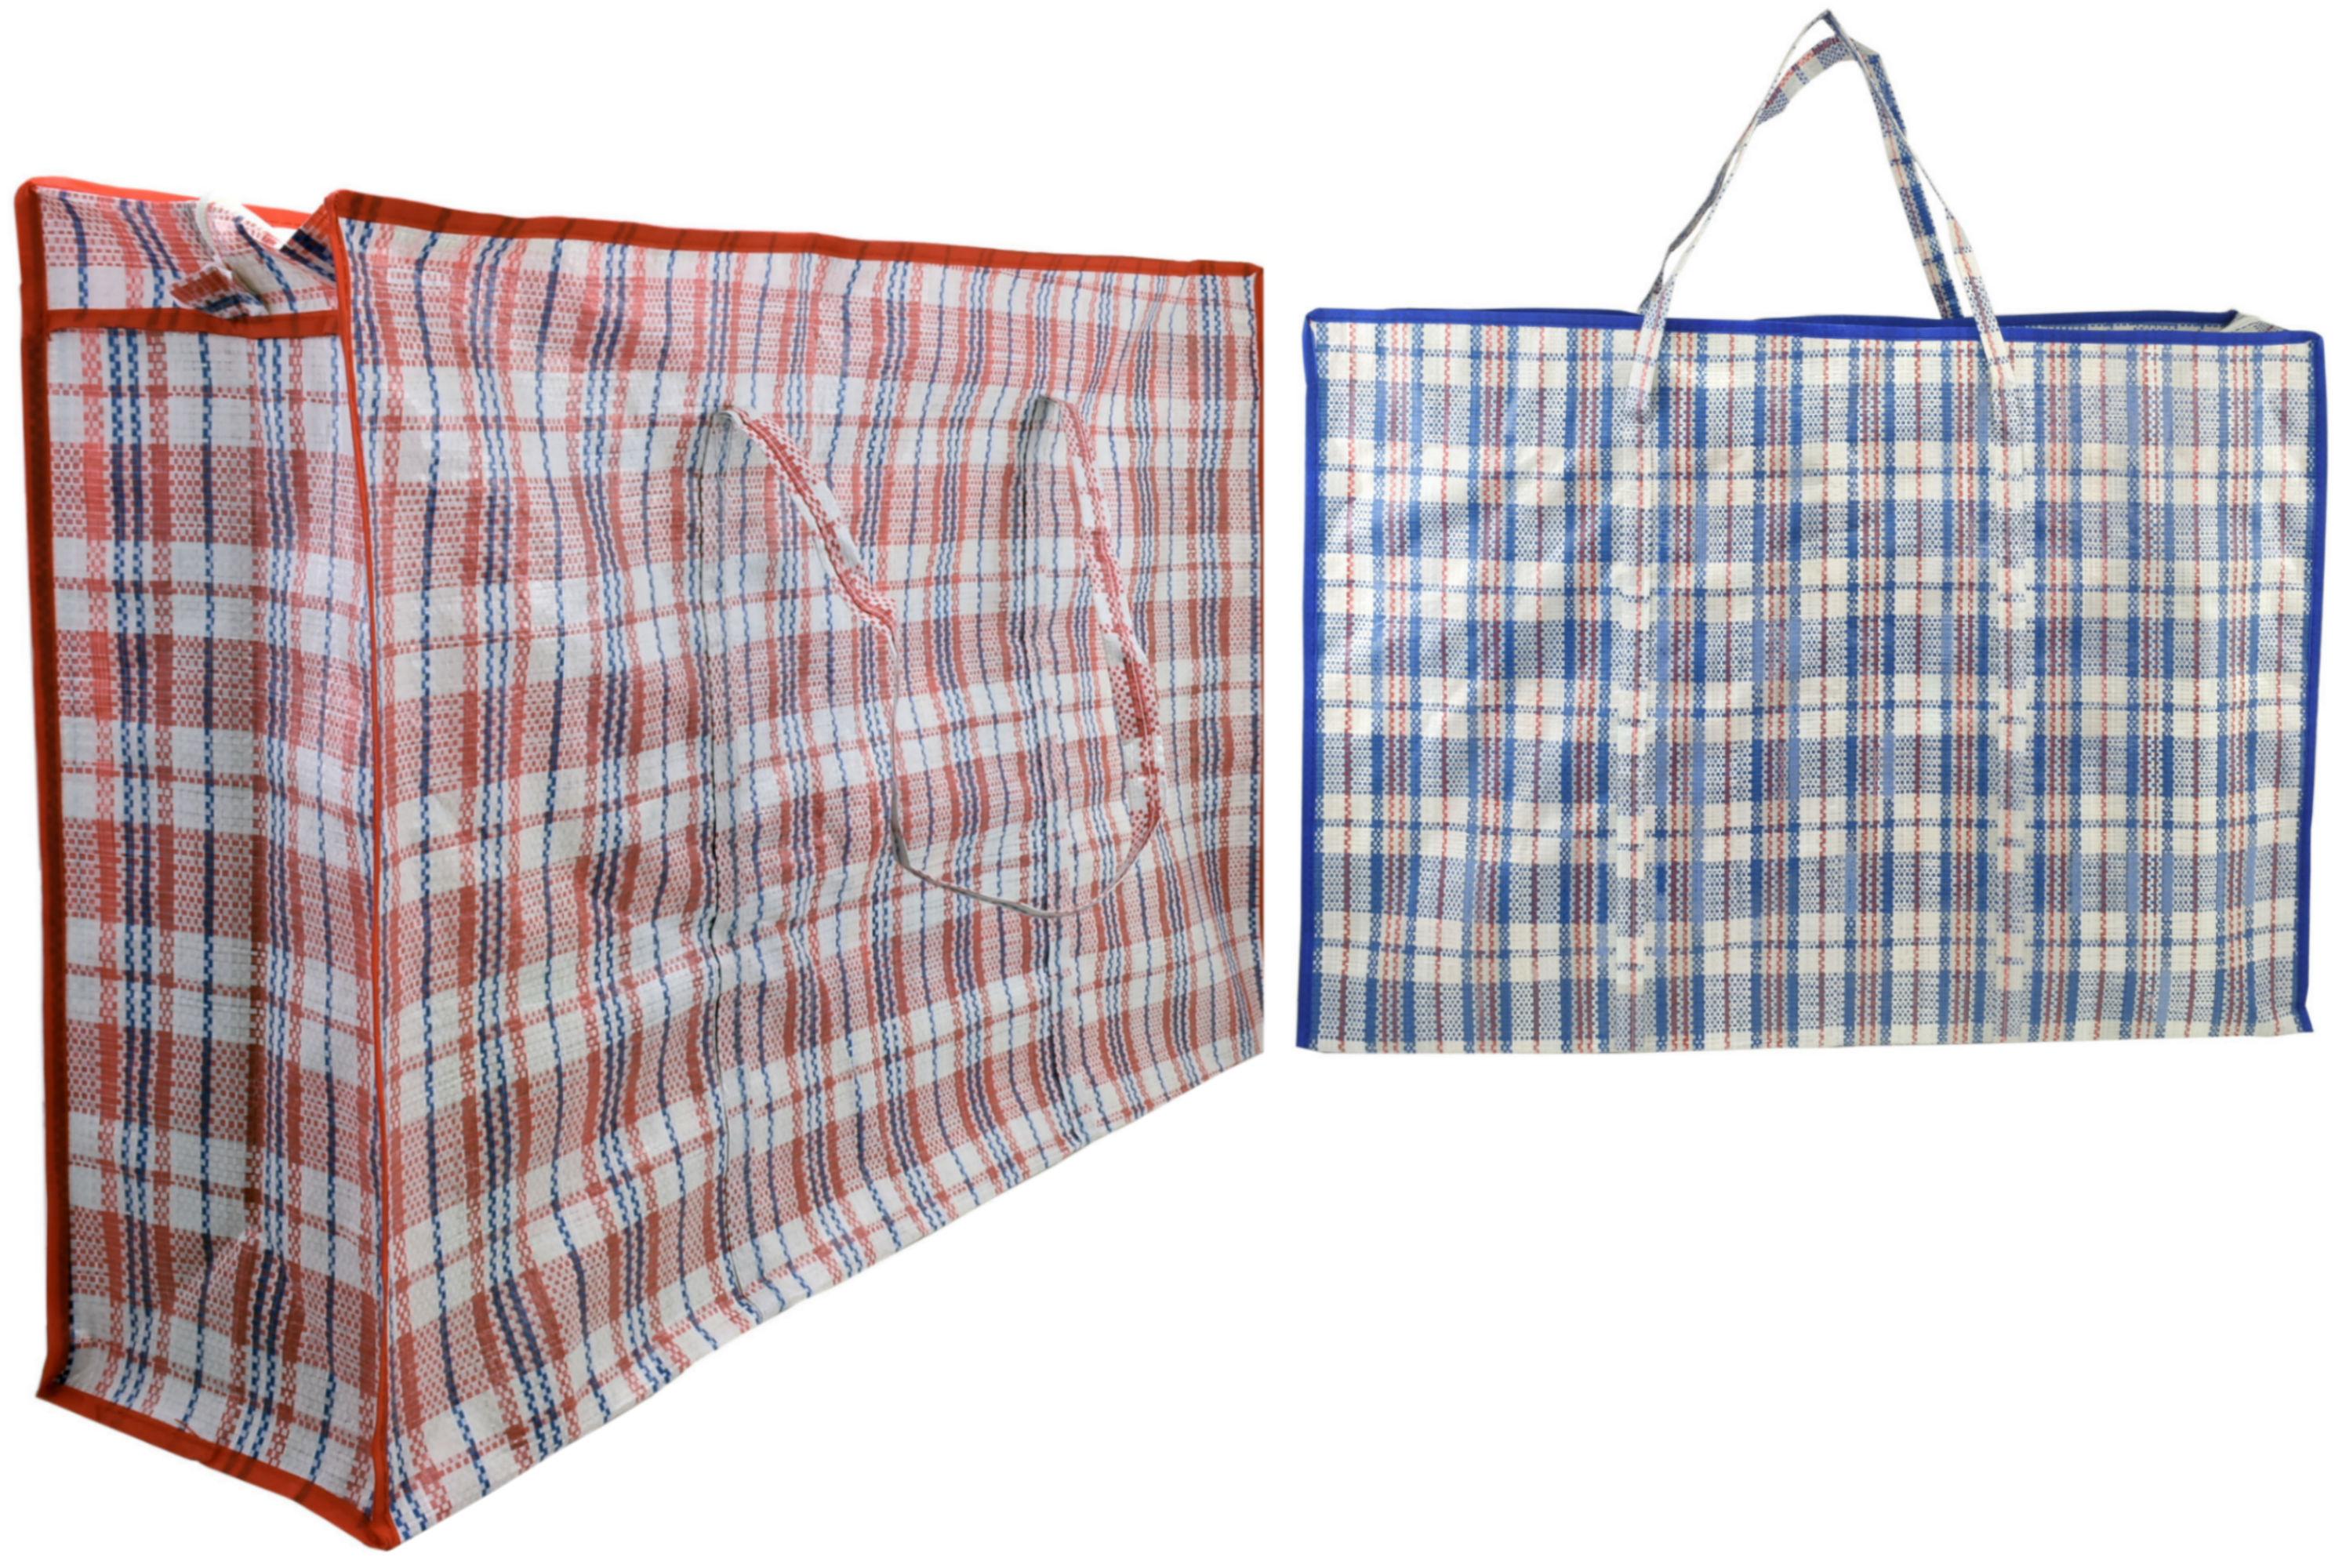 80x52x20cm Striped Shopping Bag 95gm 2 Asst Red & Blue